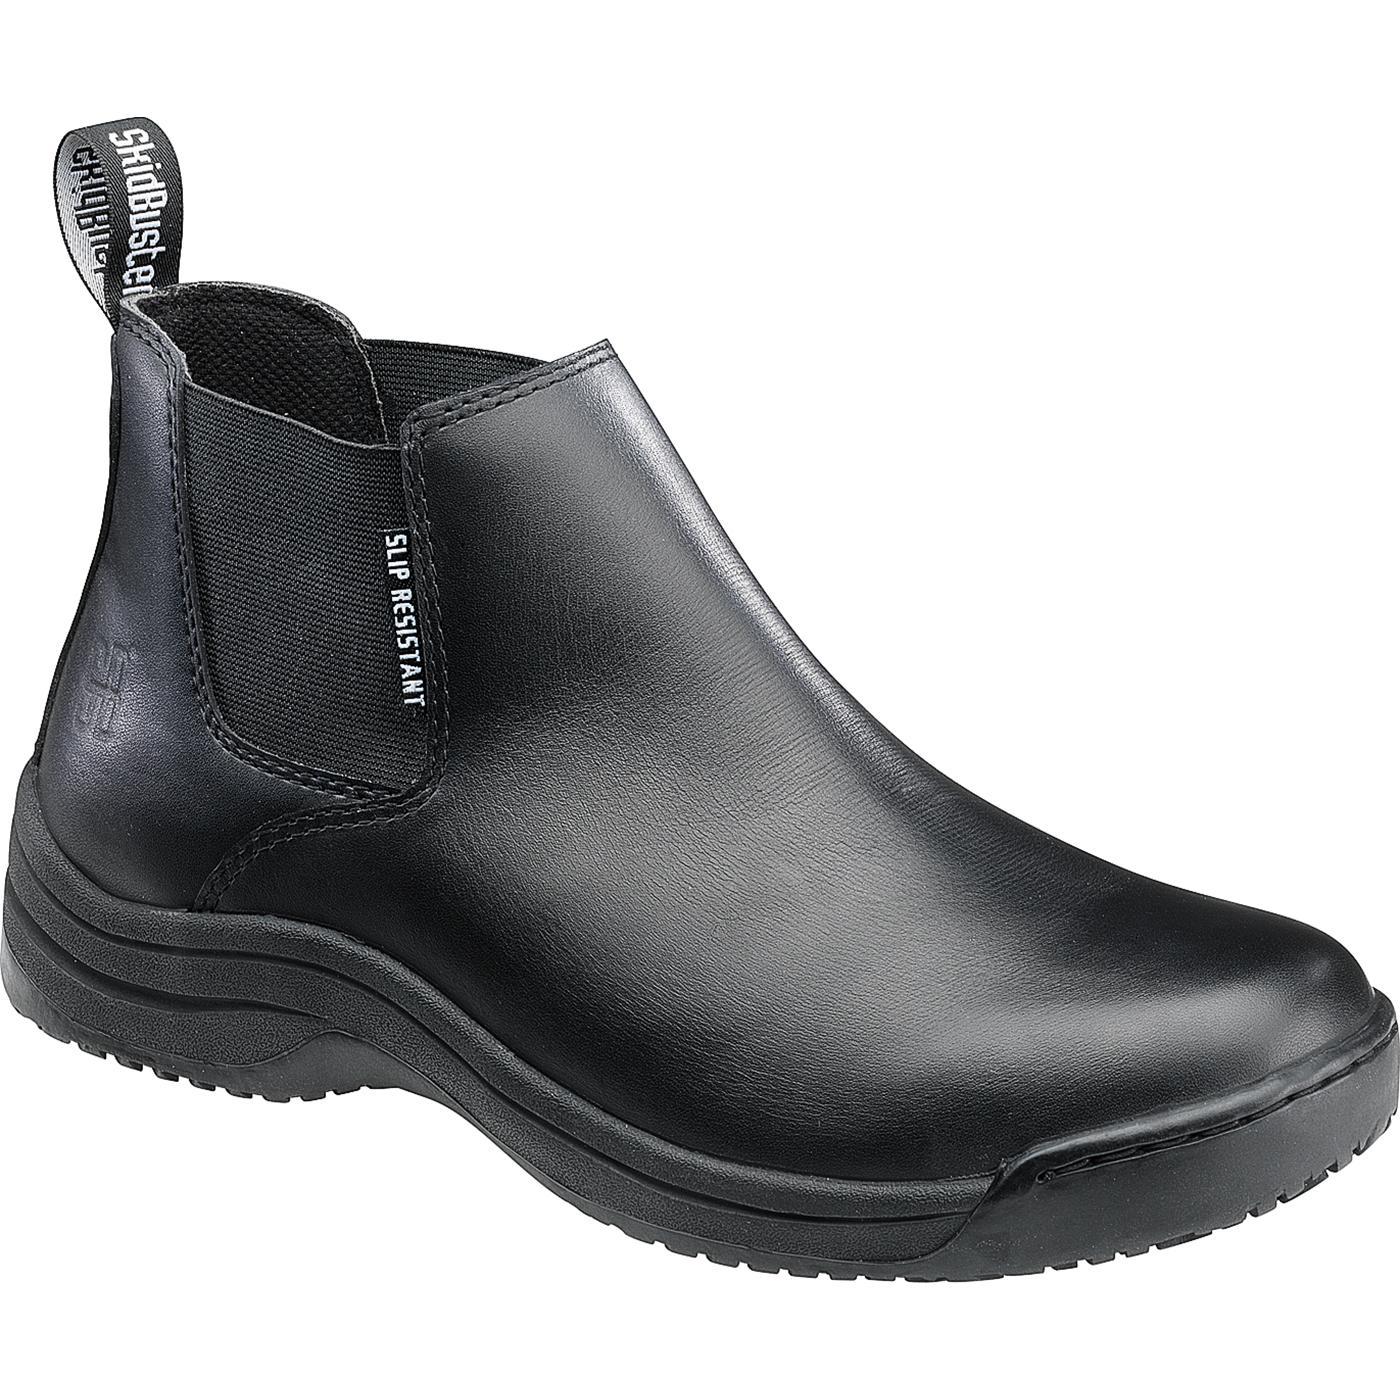 Black Skid Resistant Shoes